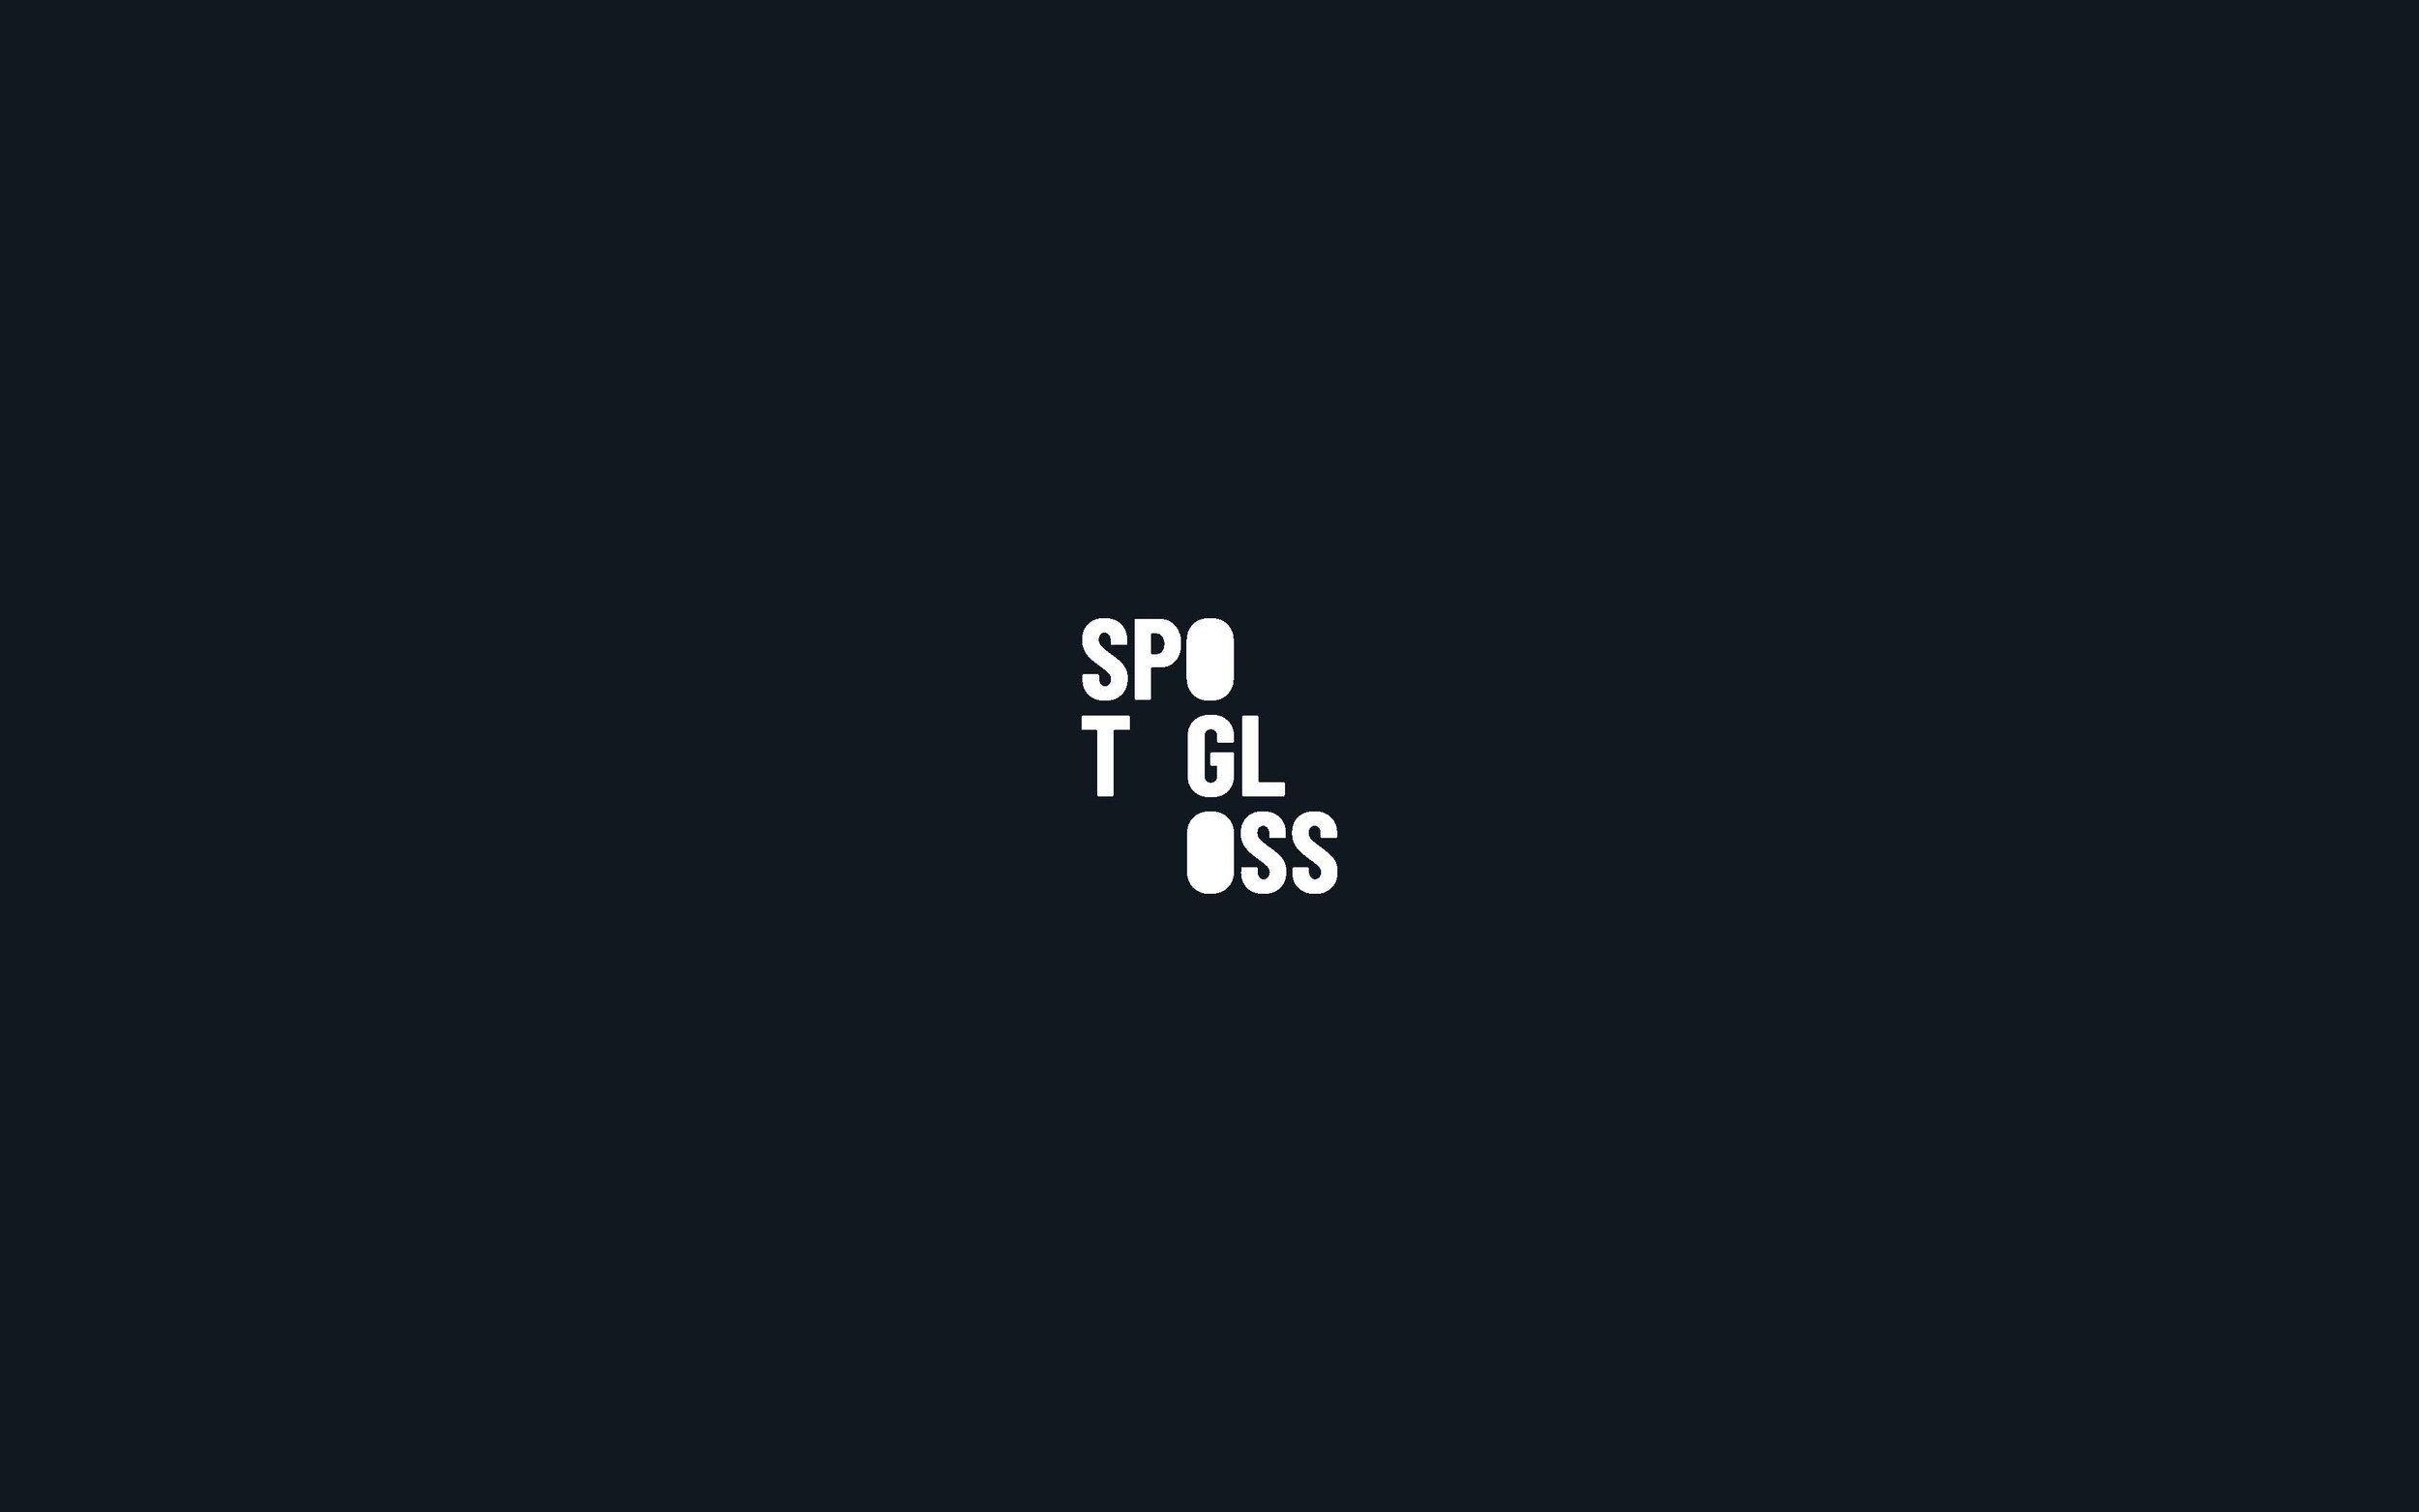 SPOTGLOSS_ConceptPresentation_120518_Page_01.jpg